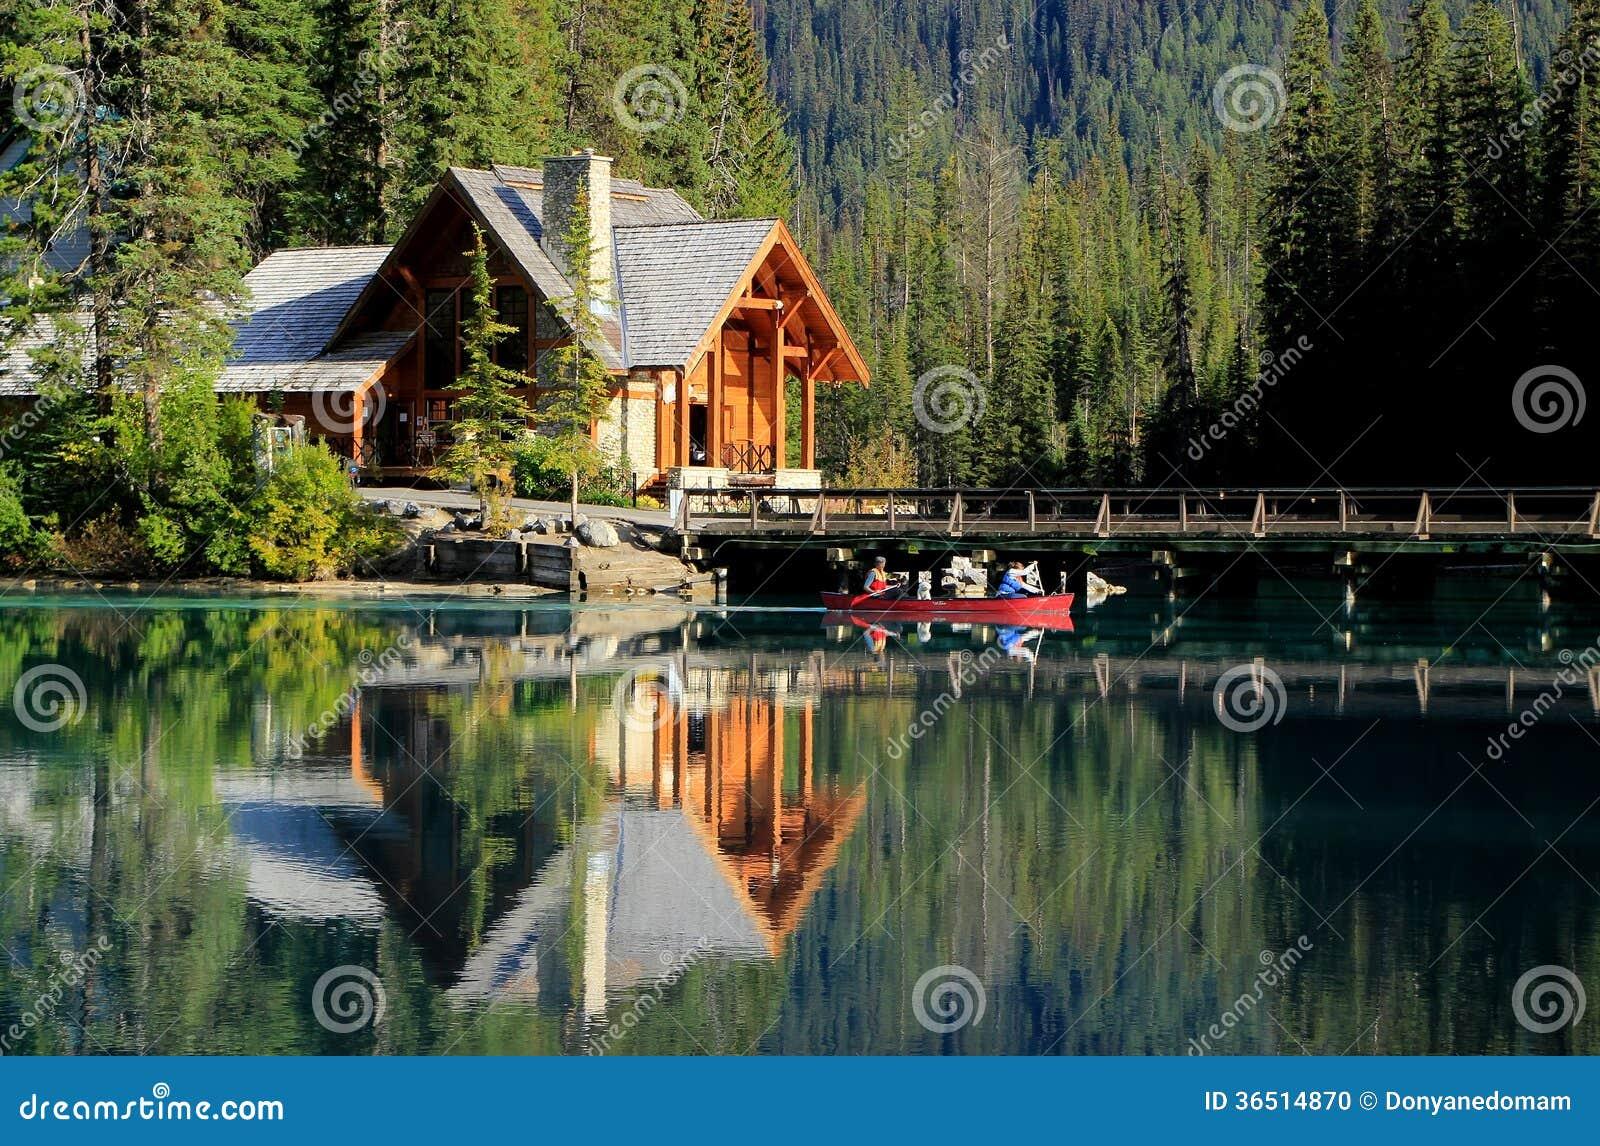 wooden house at emerald lake yoho national park canada - Photo Maison Canada